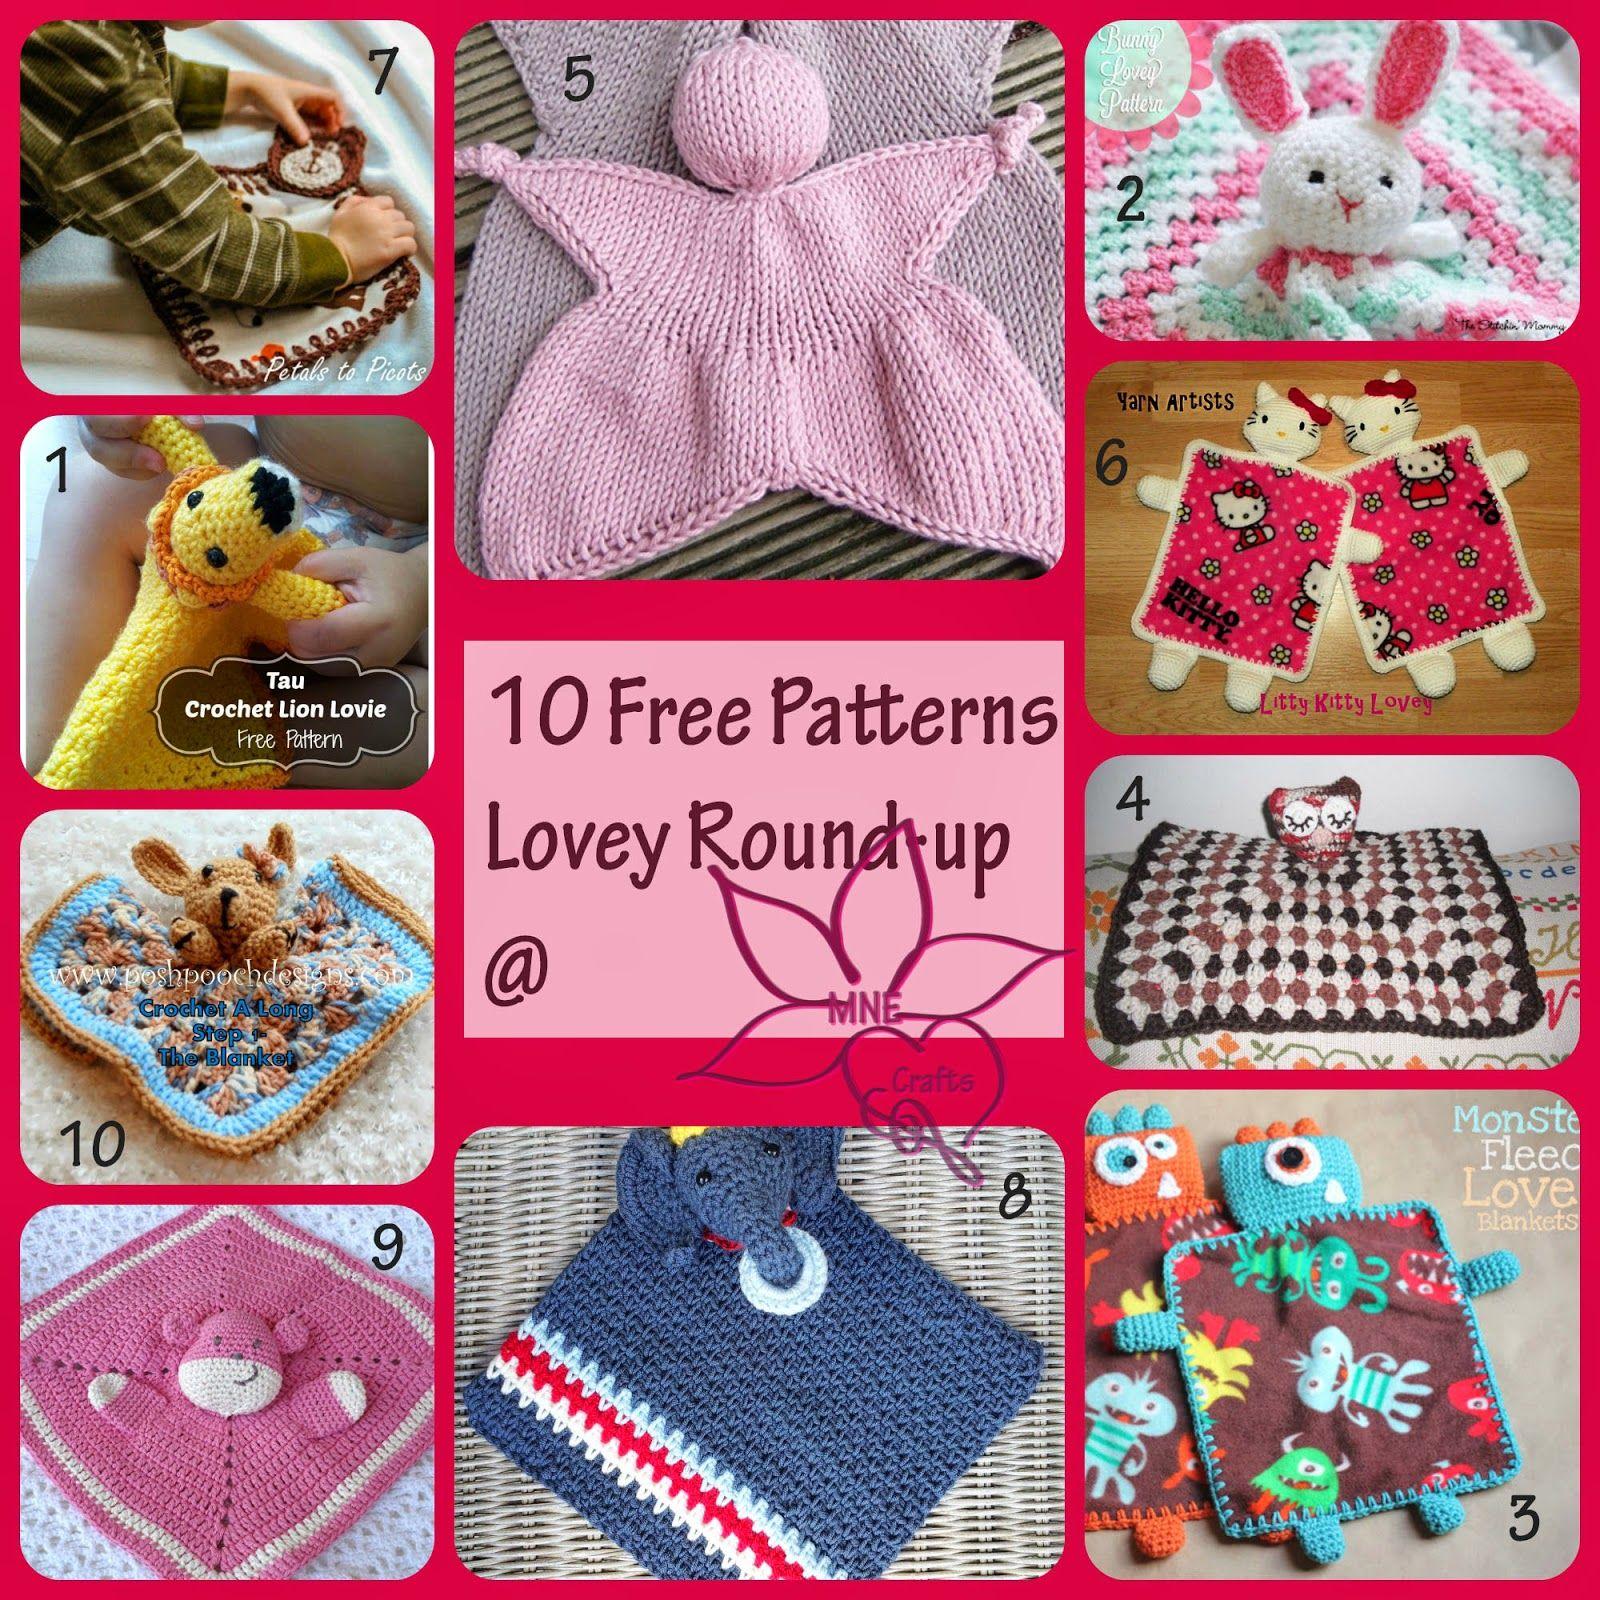 Manda Nicoles Crochet Patterns Lovey Round Up 10 Free Trippy Hippy Afghan Pattern Kingdom